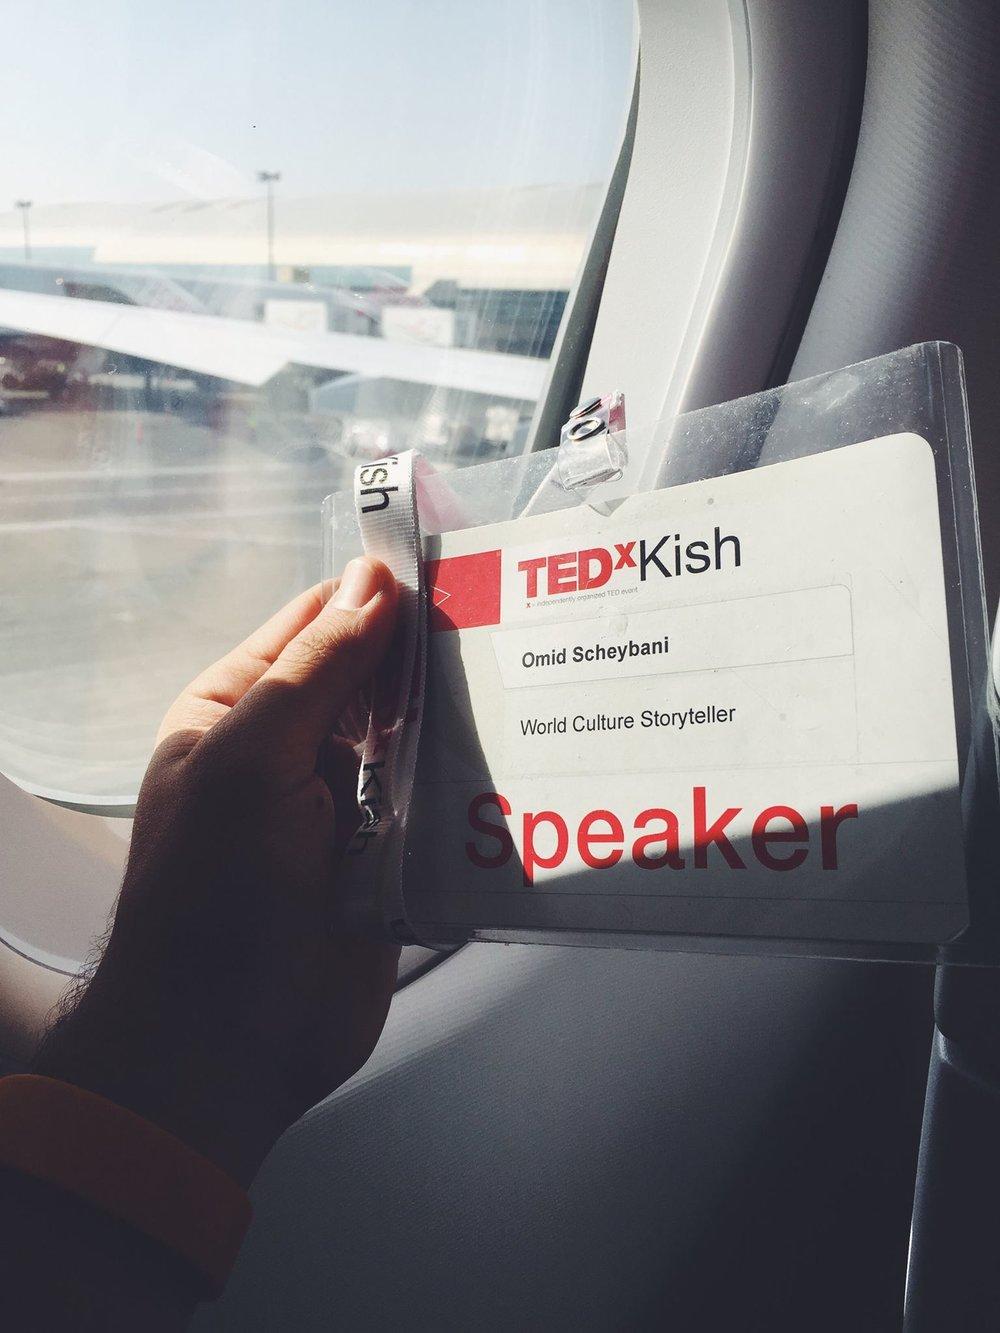 Speaker badge at TEDxKish